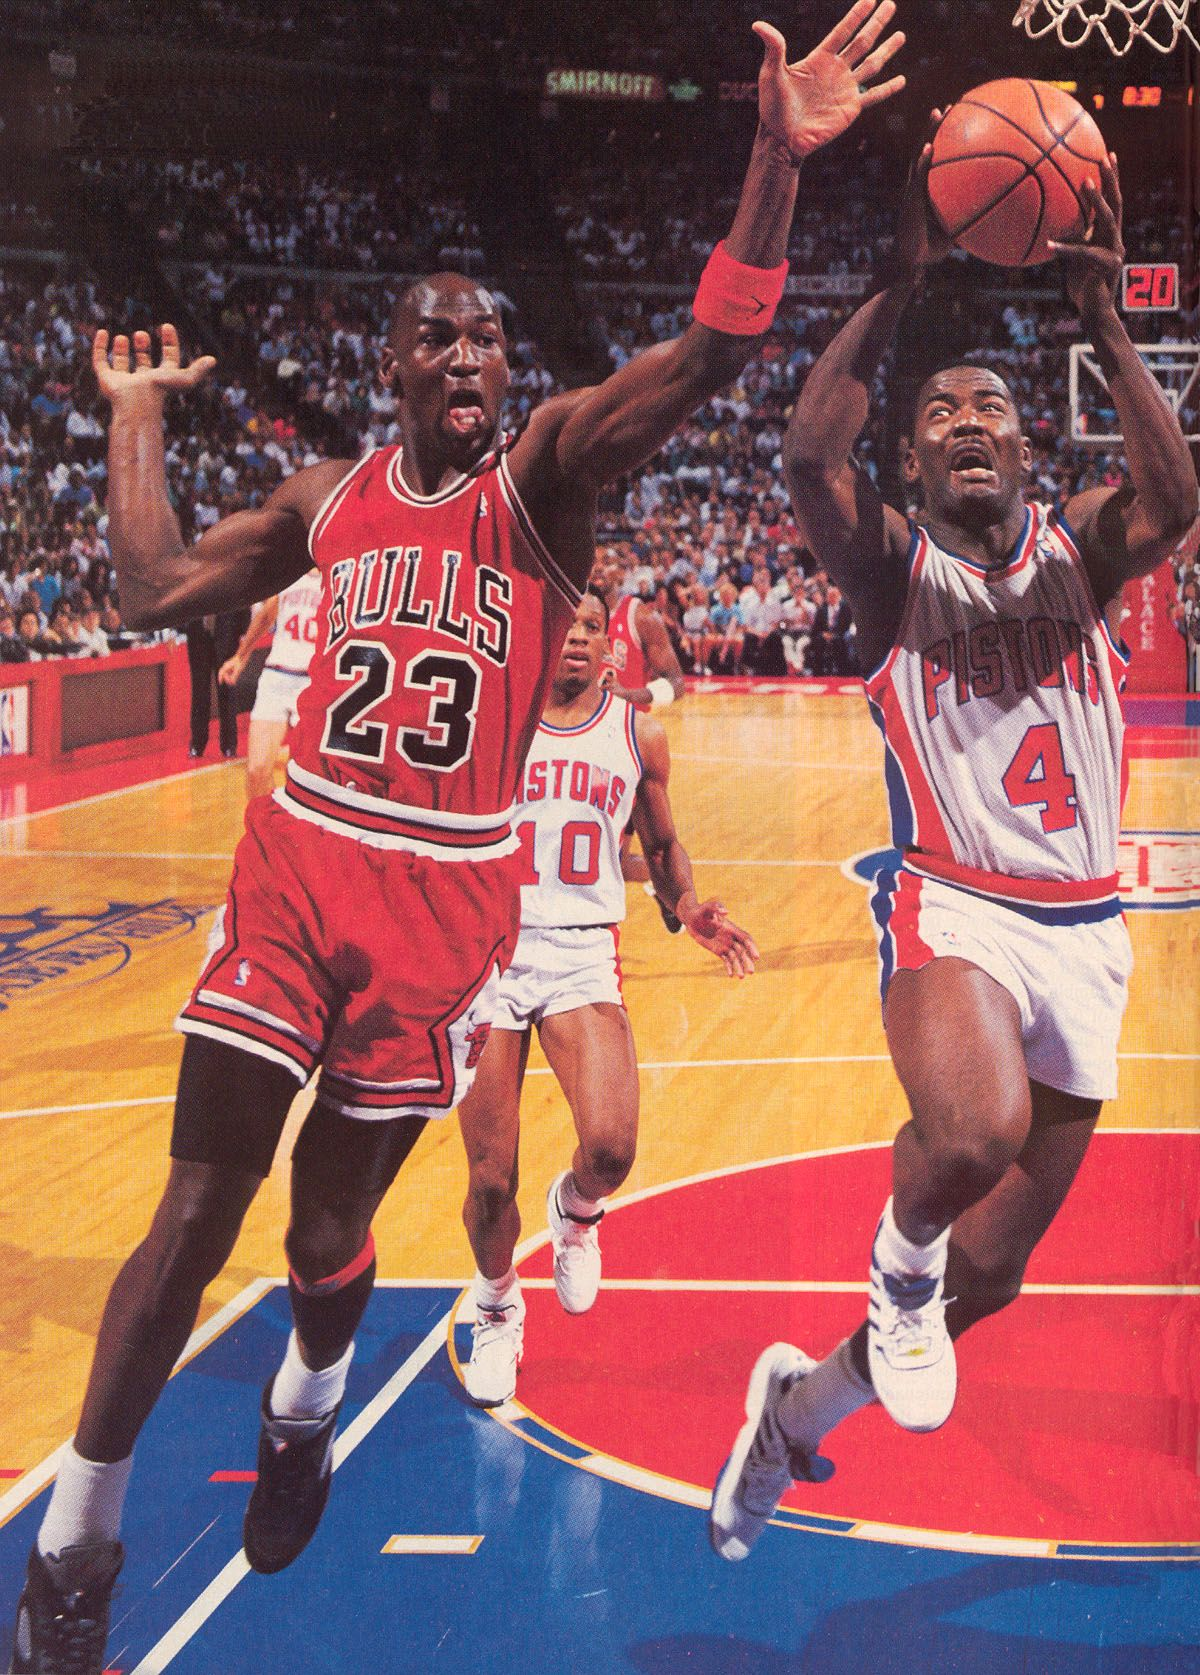 1fff281244b104 89 90 G7 East Finals Detroit - Joe Dumars Layup 1990.06.11 ...